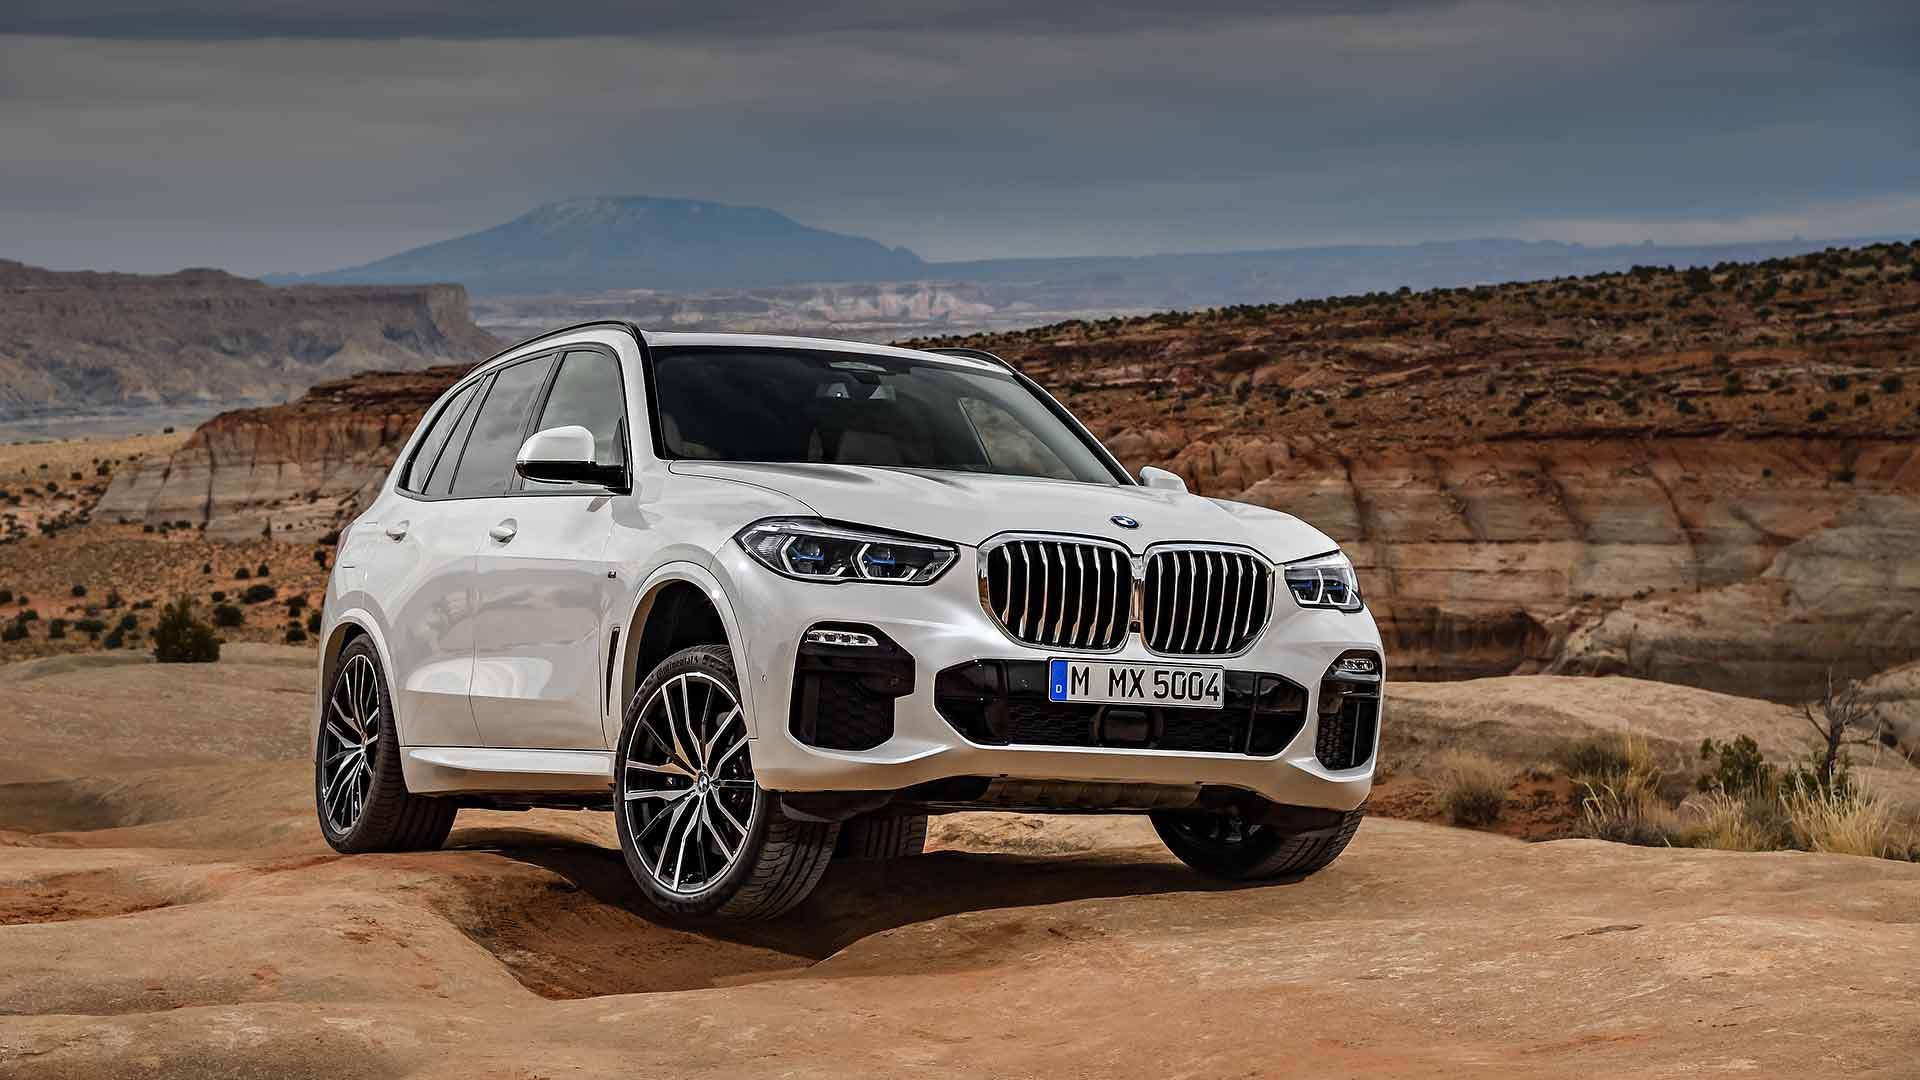 BMW-X5-G05-2019-7.jpg